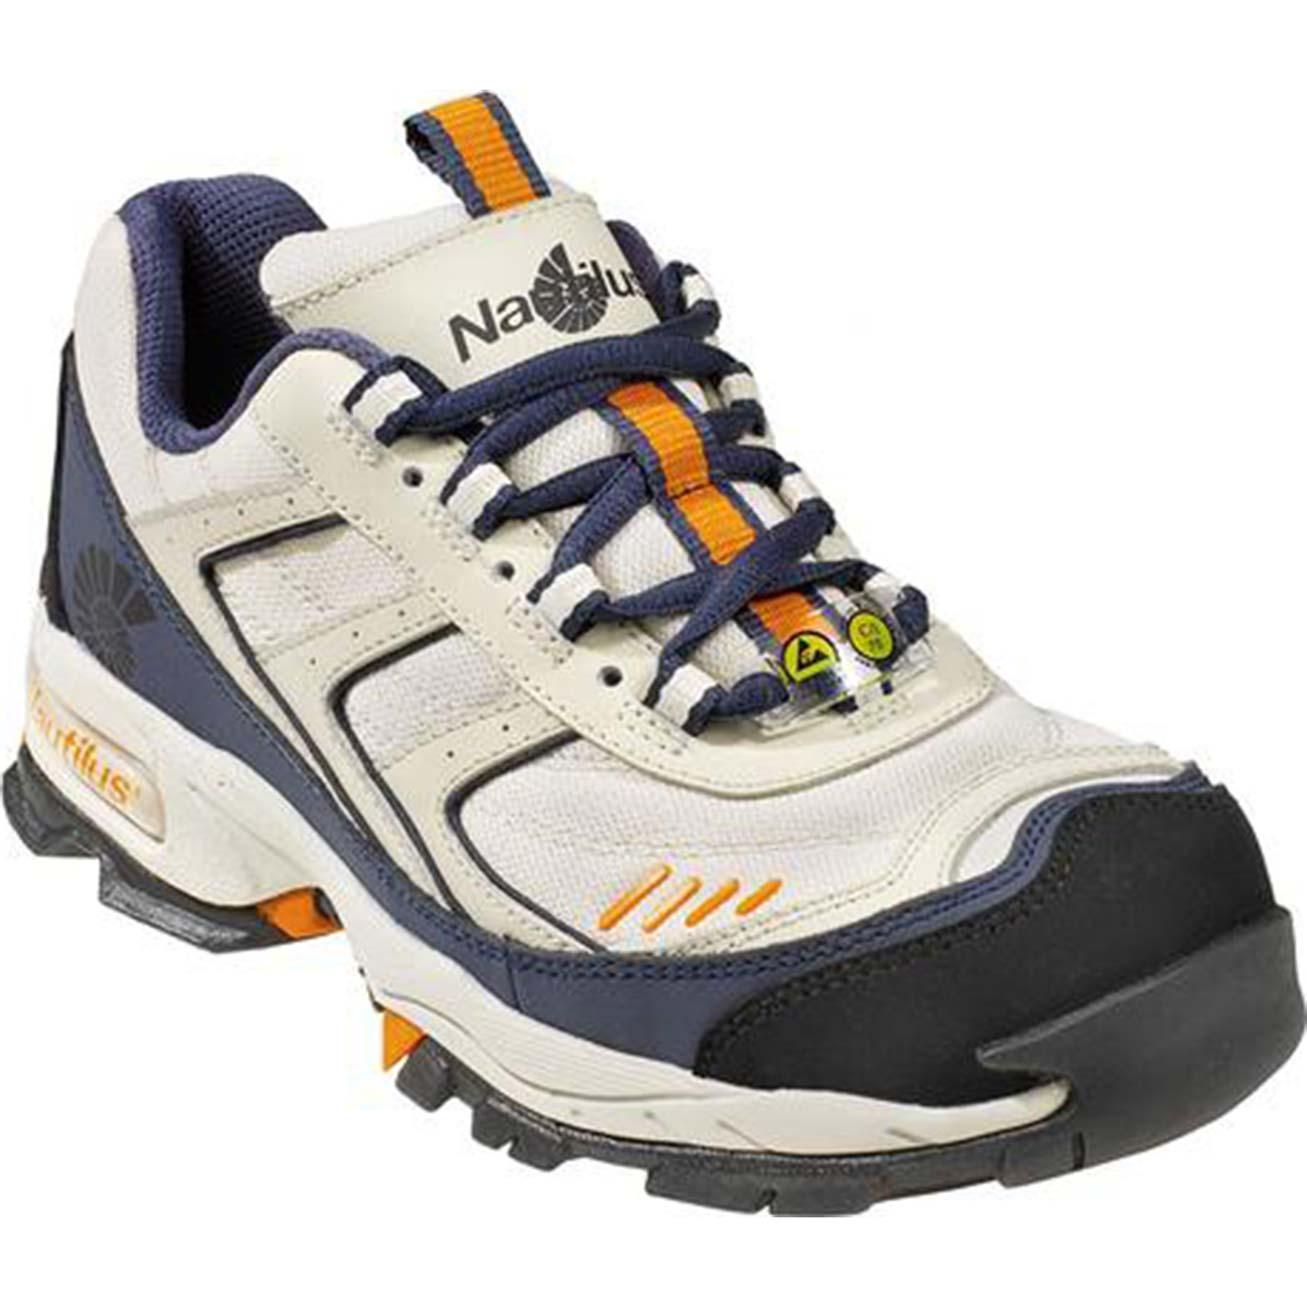 dcefc231a1213c Nautilus Women s Static-Dissipative Steel Toe Work ShoeNautilus Women s  Static-Dissipative Steel Toe Work Shoe